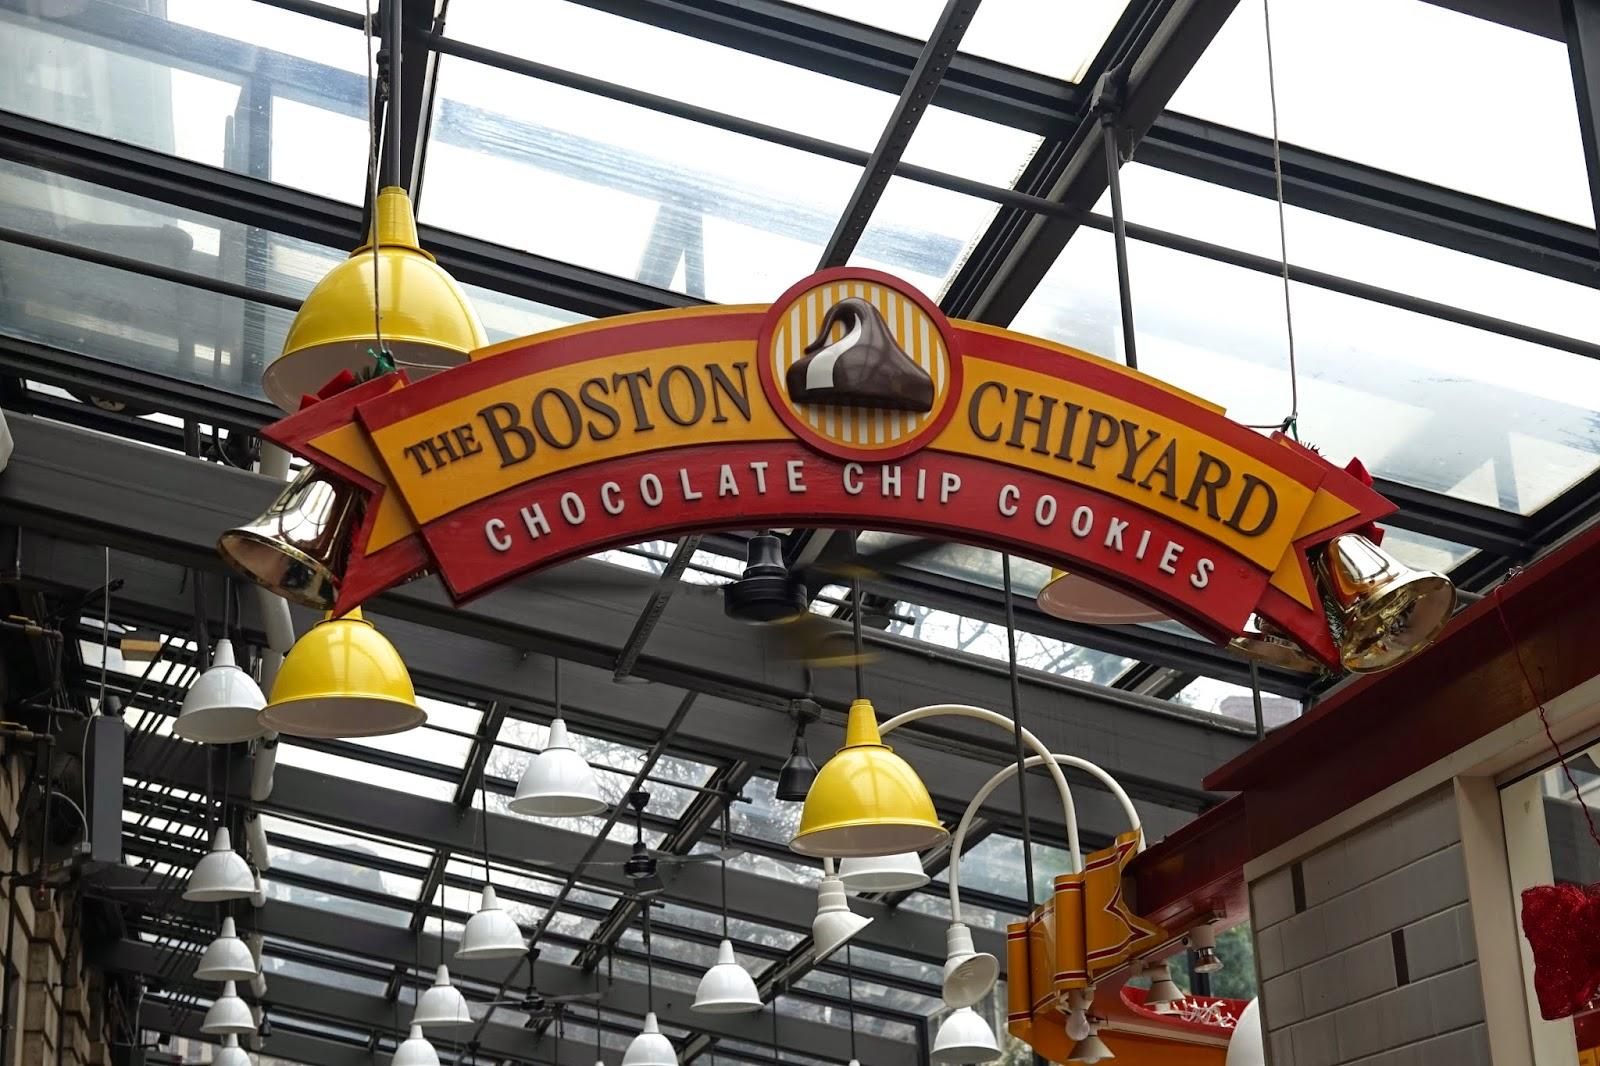 the boston chipyard chocolate chip cookies